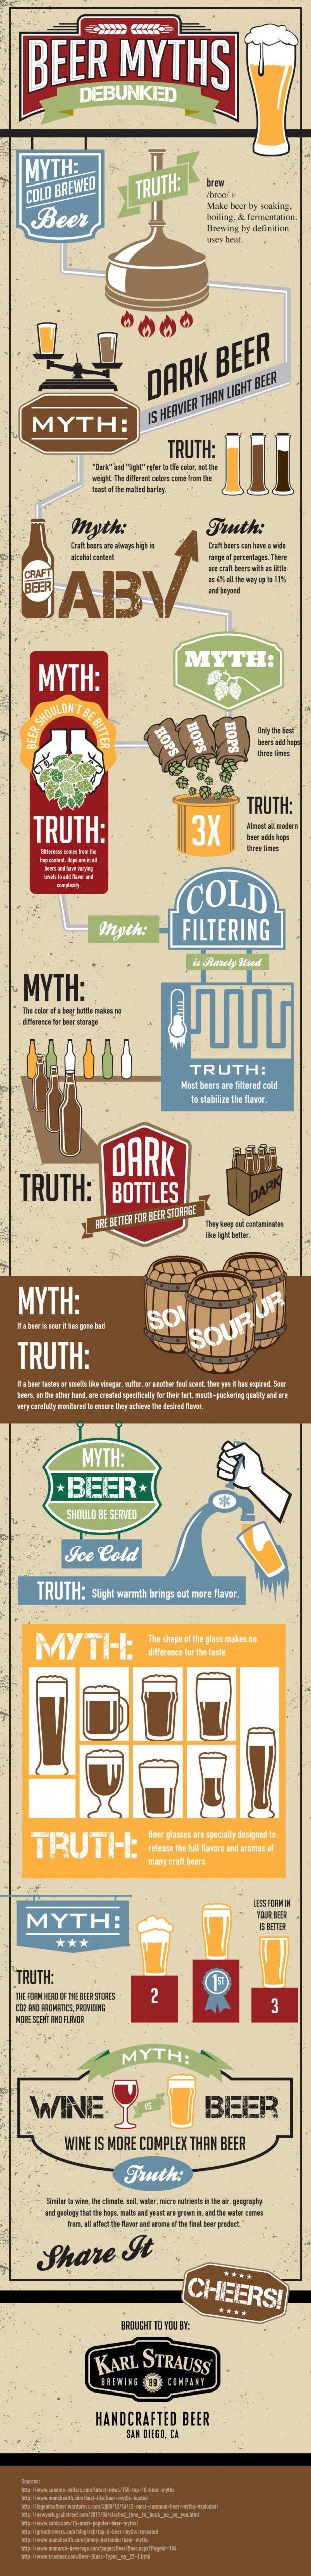 Beer Myths